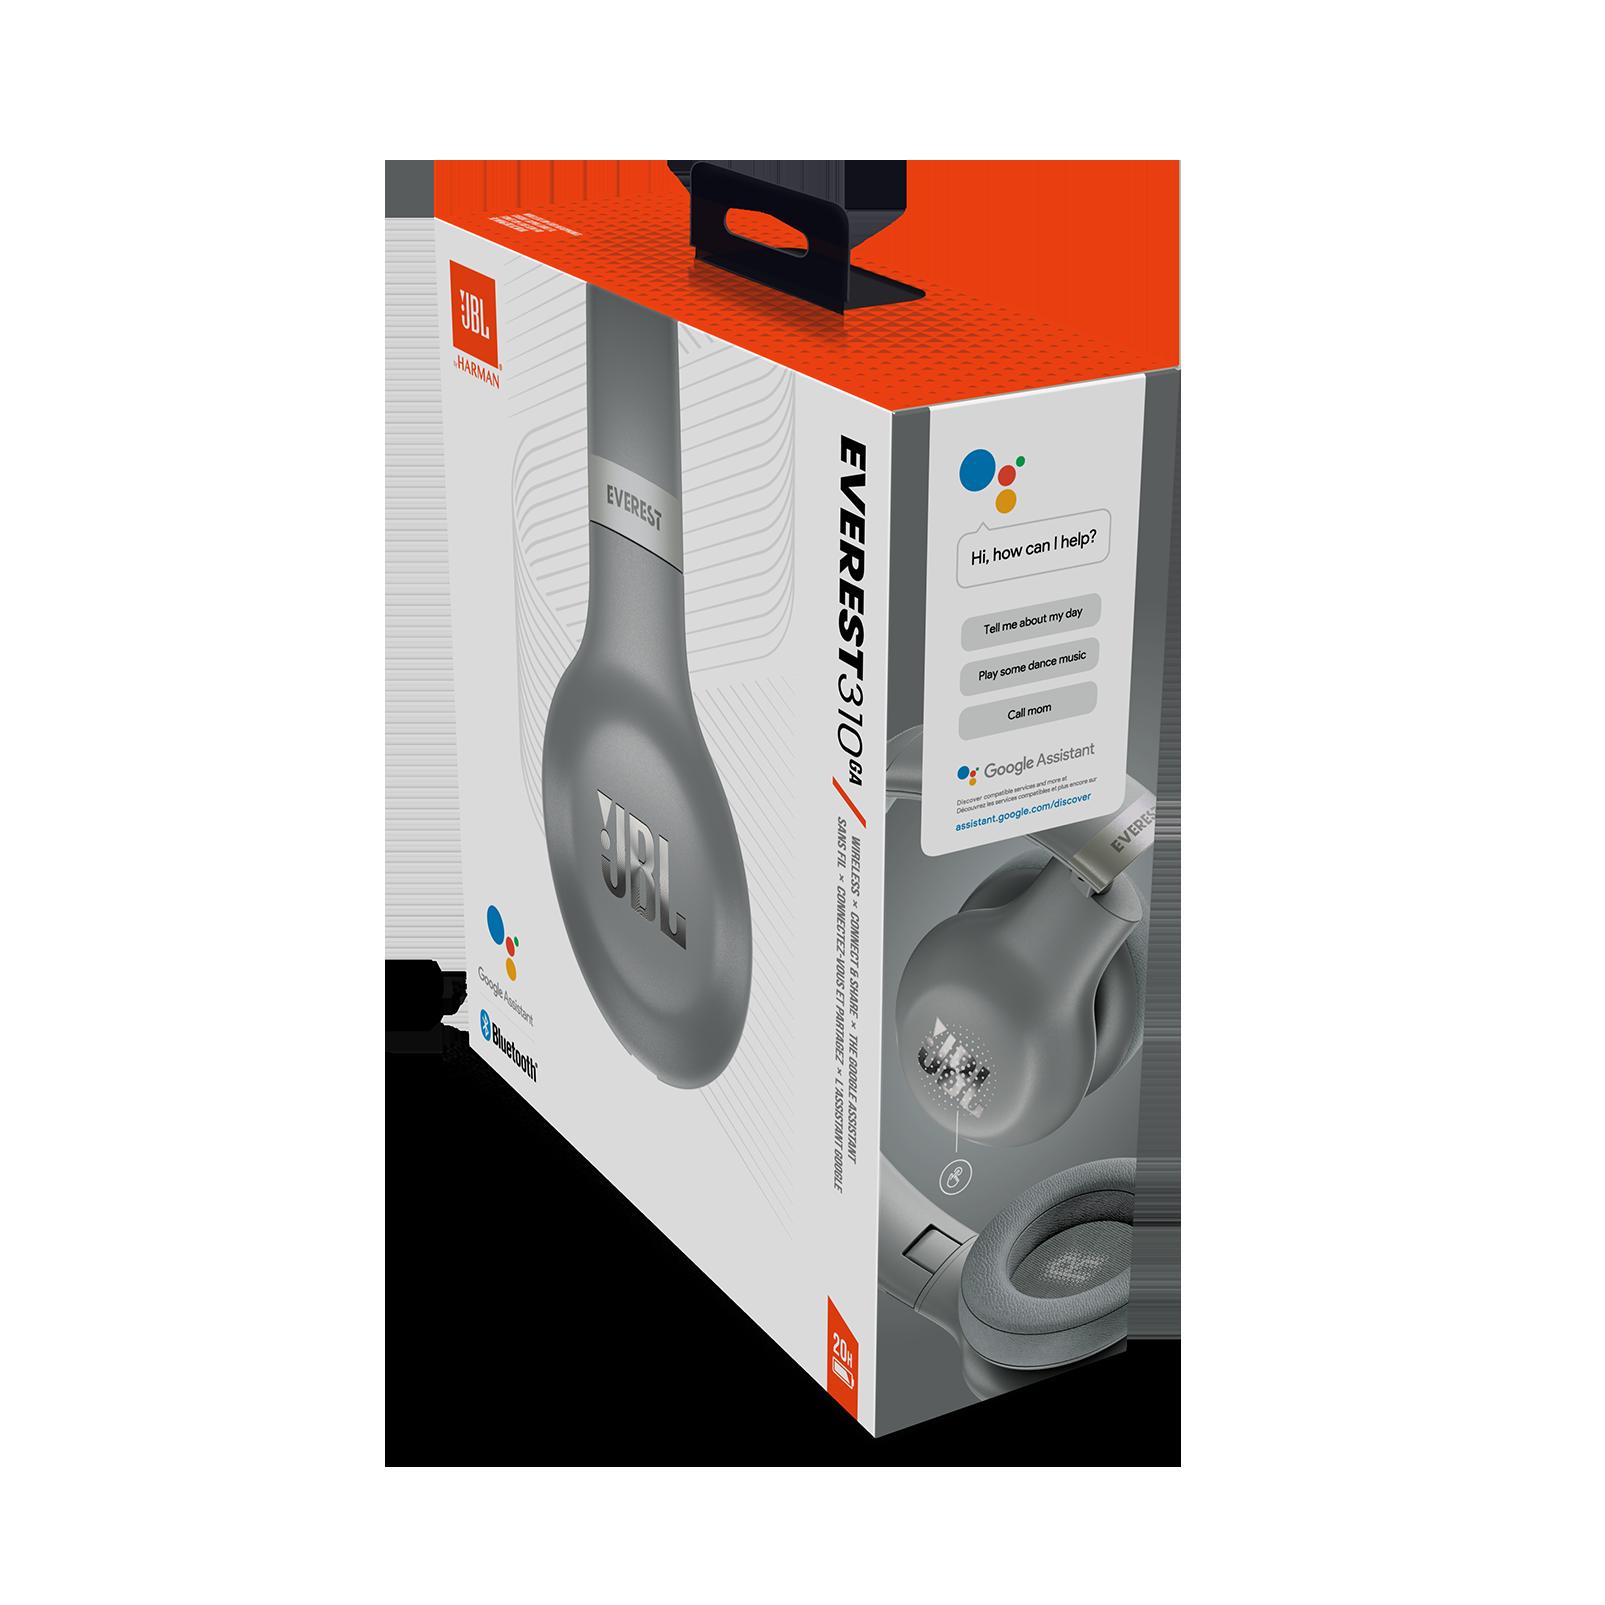 everest audio driver download